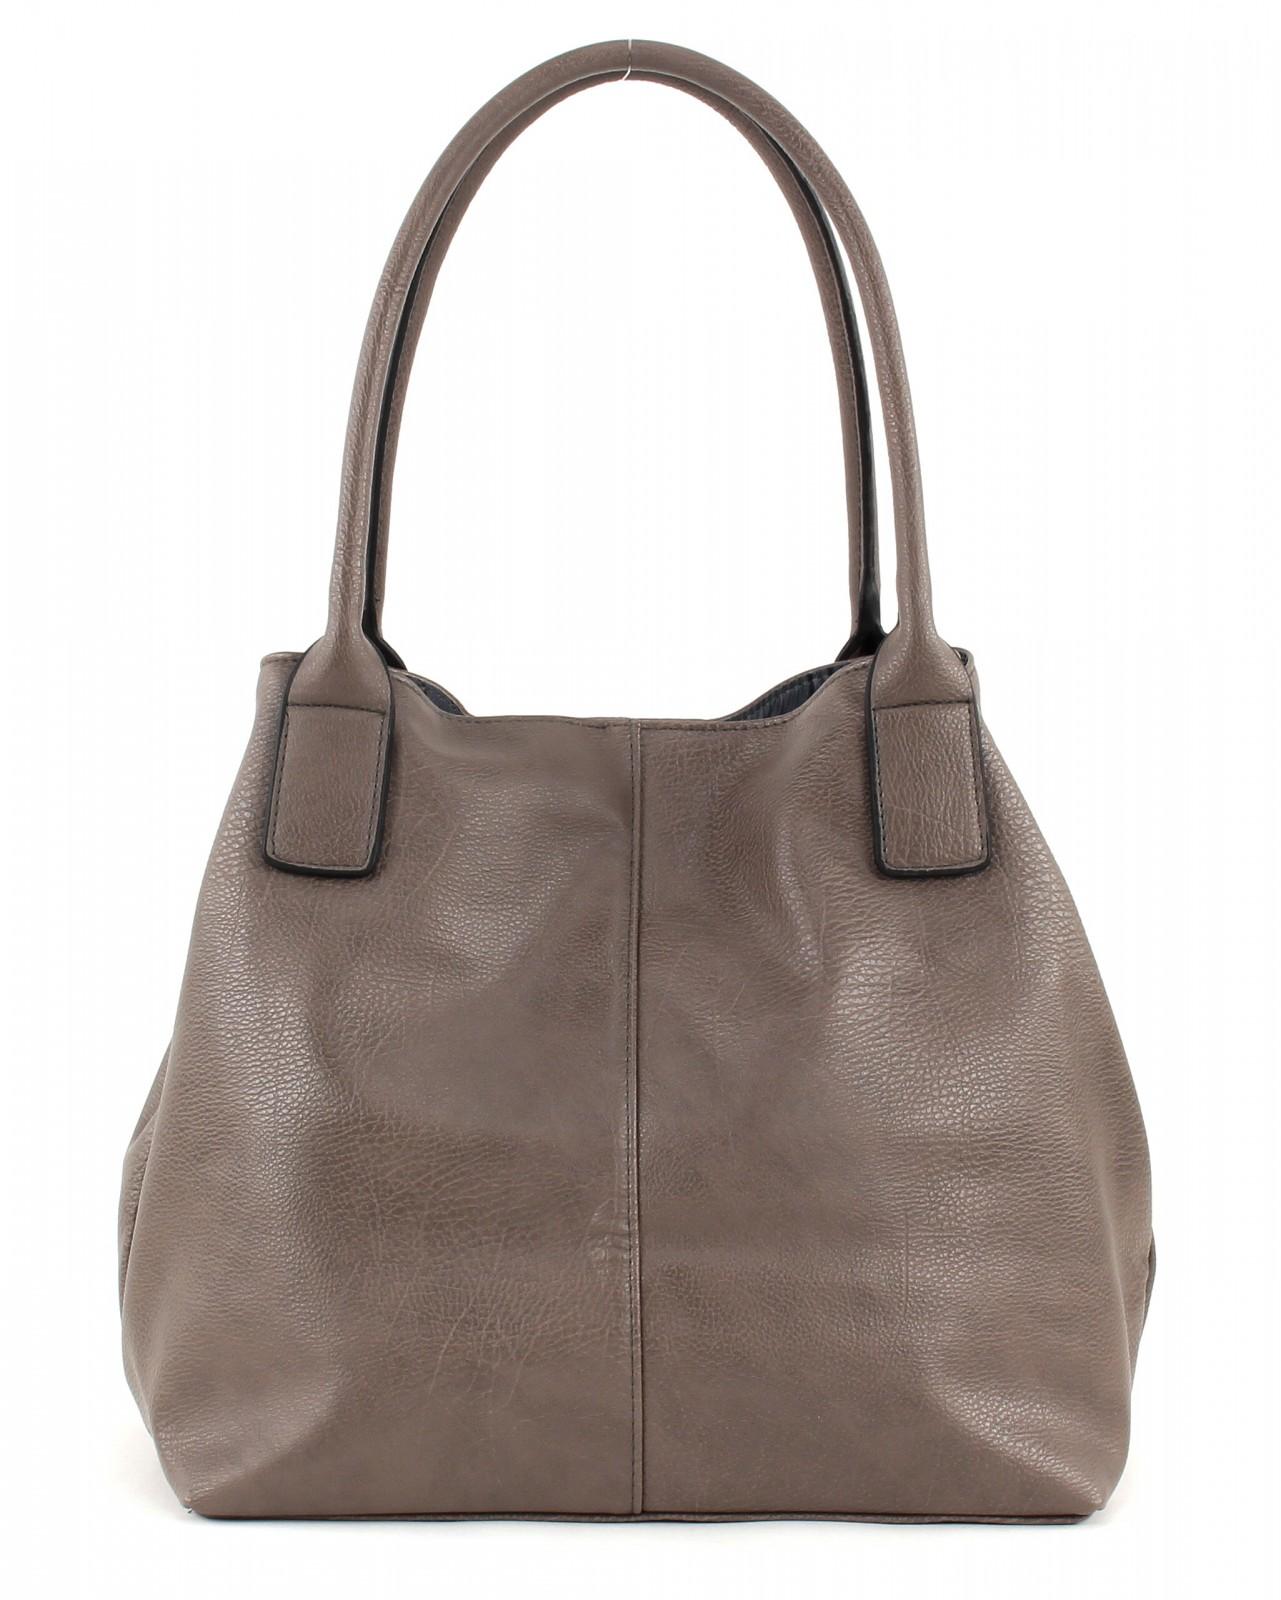 tom tailor miripu shopper braun tasche handtasche ebay. Black Bedroom Furniture Sets. Home Design Ideas